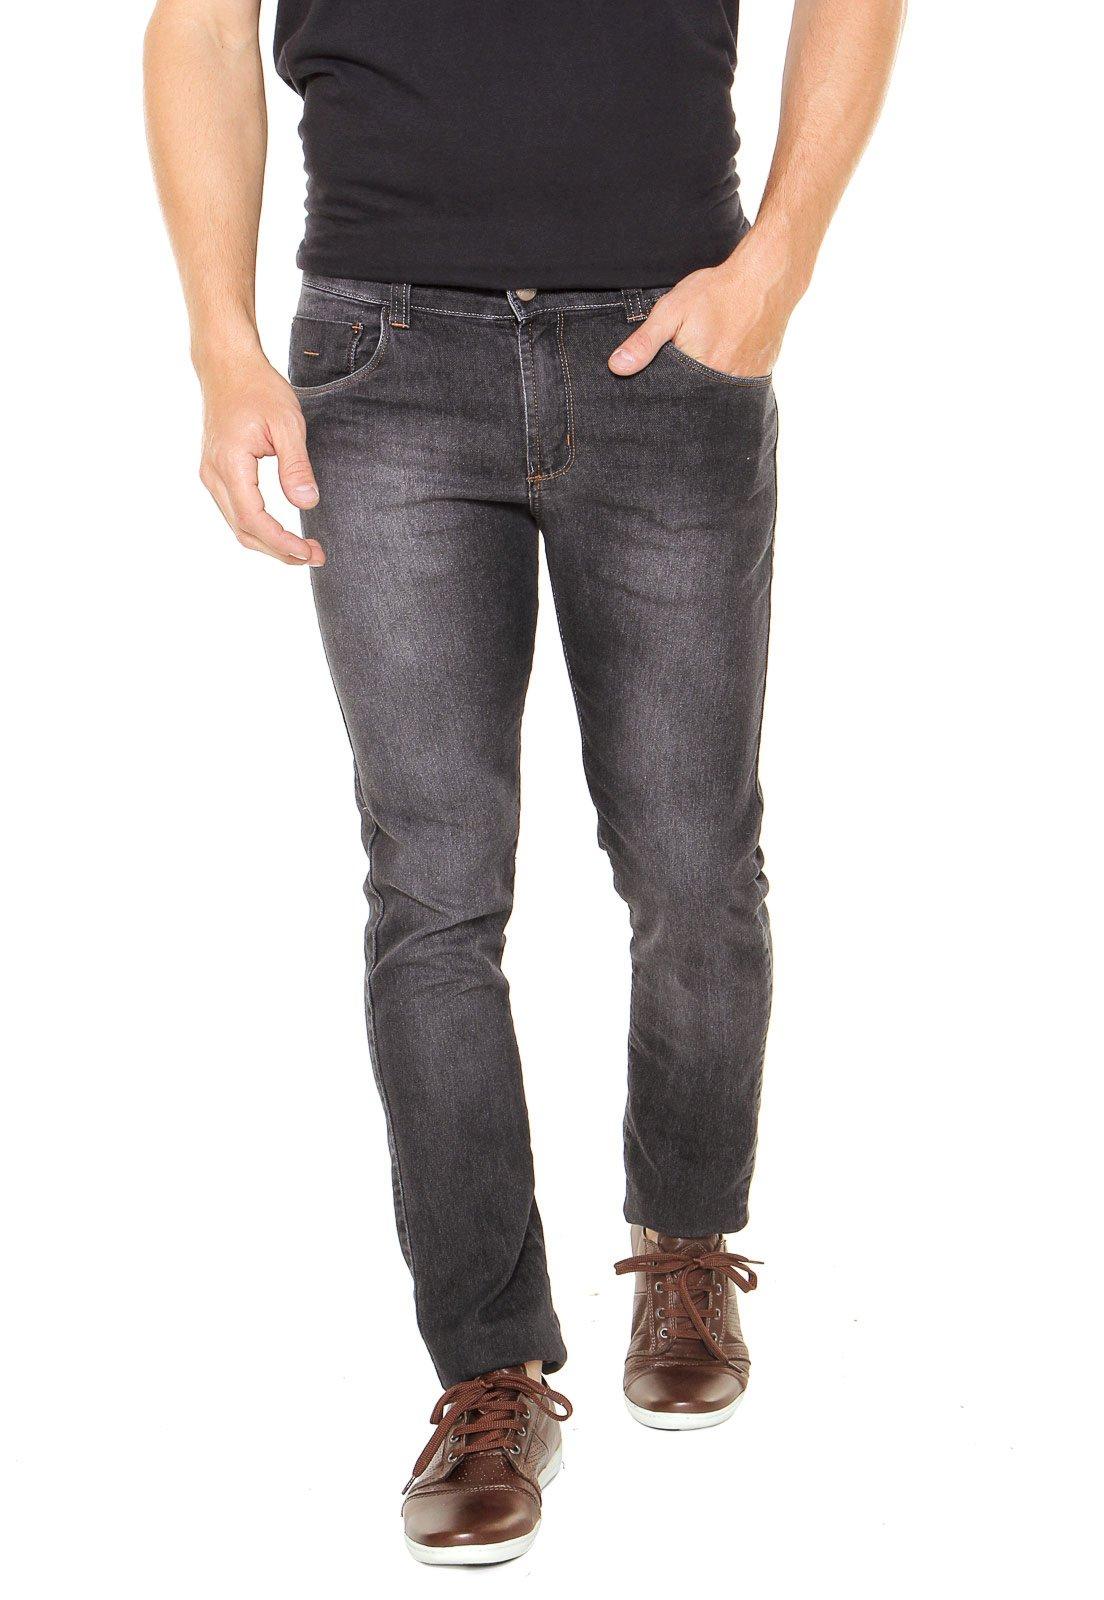 913f9303293fd Calça Jeans Mr Kitsch 9131 Preta - Marca Mr Kitsch ...